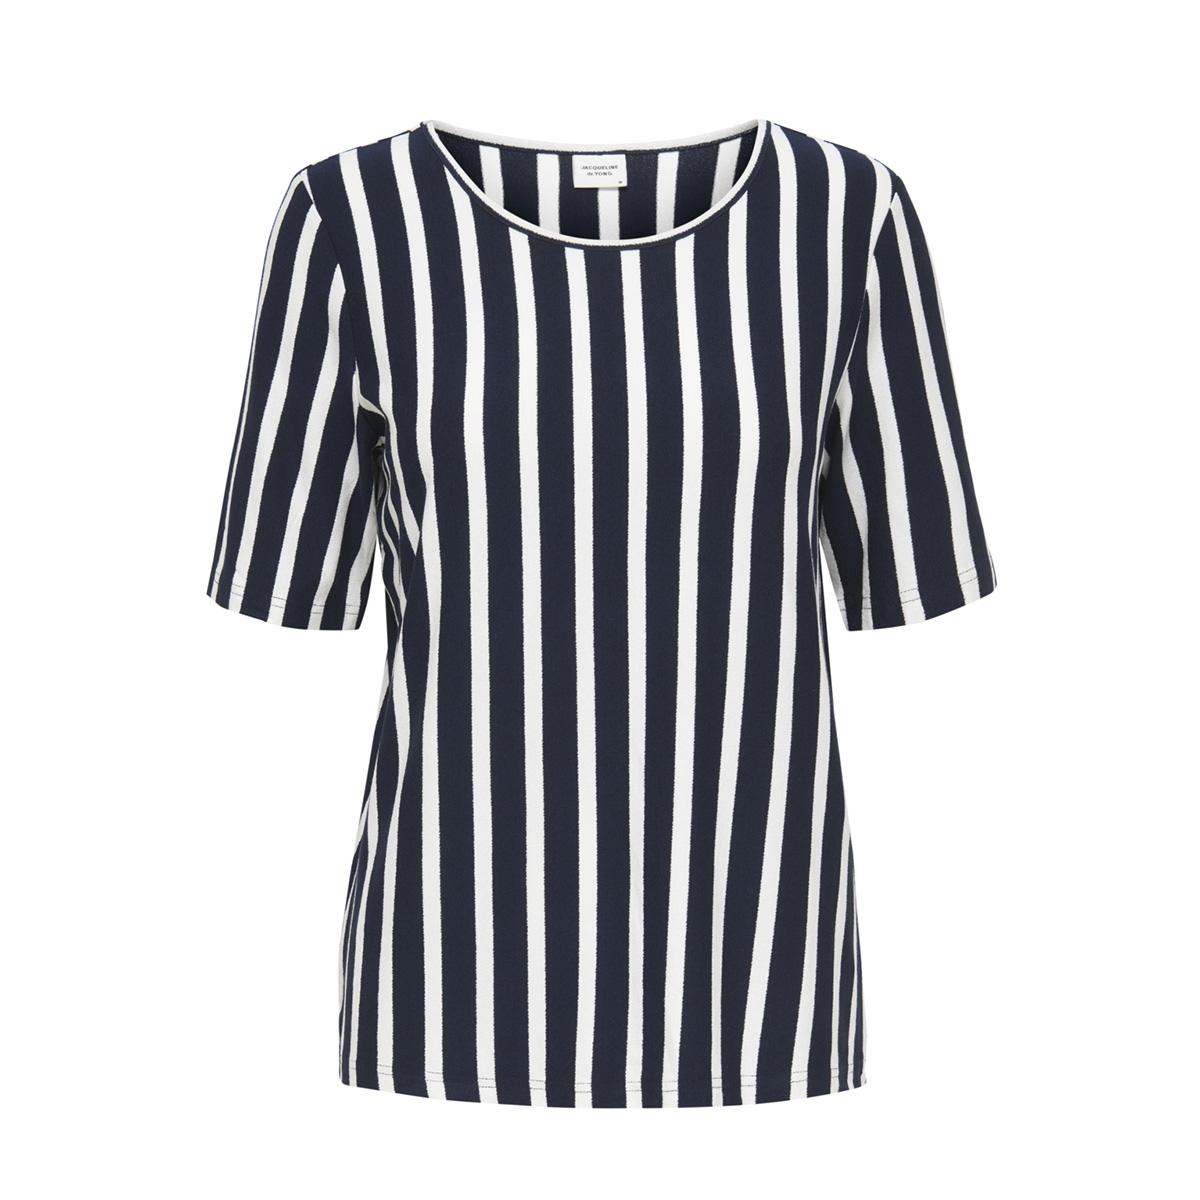 jdyalina 2 4 top jrs 15174711 jacqueline de yong t-shirt navy blazer